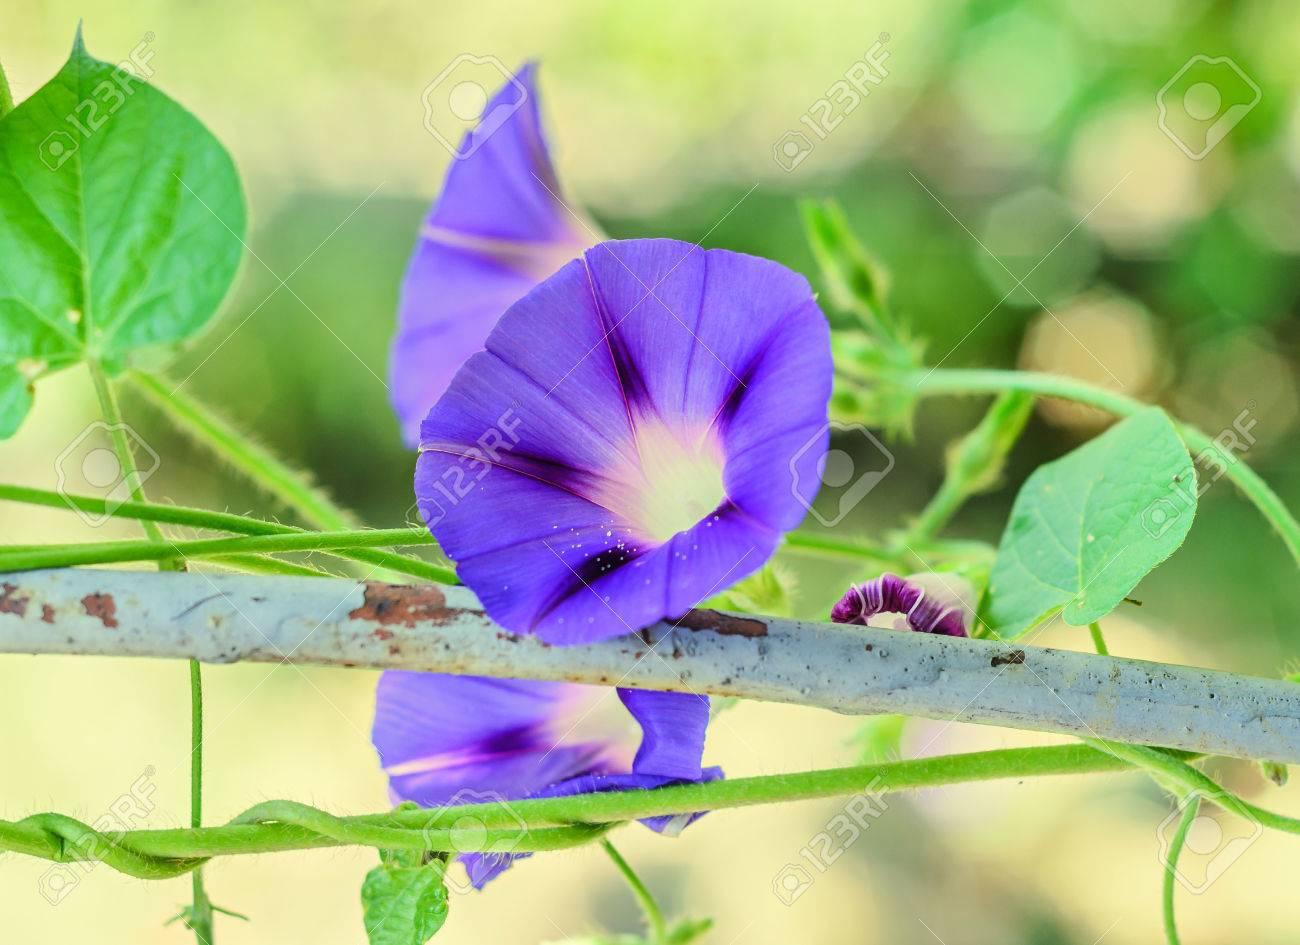 Ipomoea Purpurea Mauve Blue Flower The Purple Tall Or Common